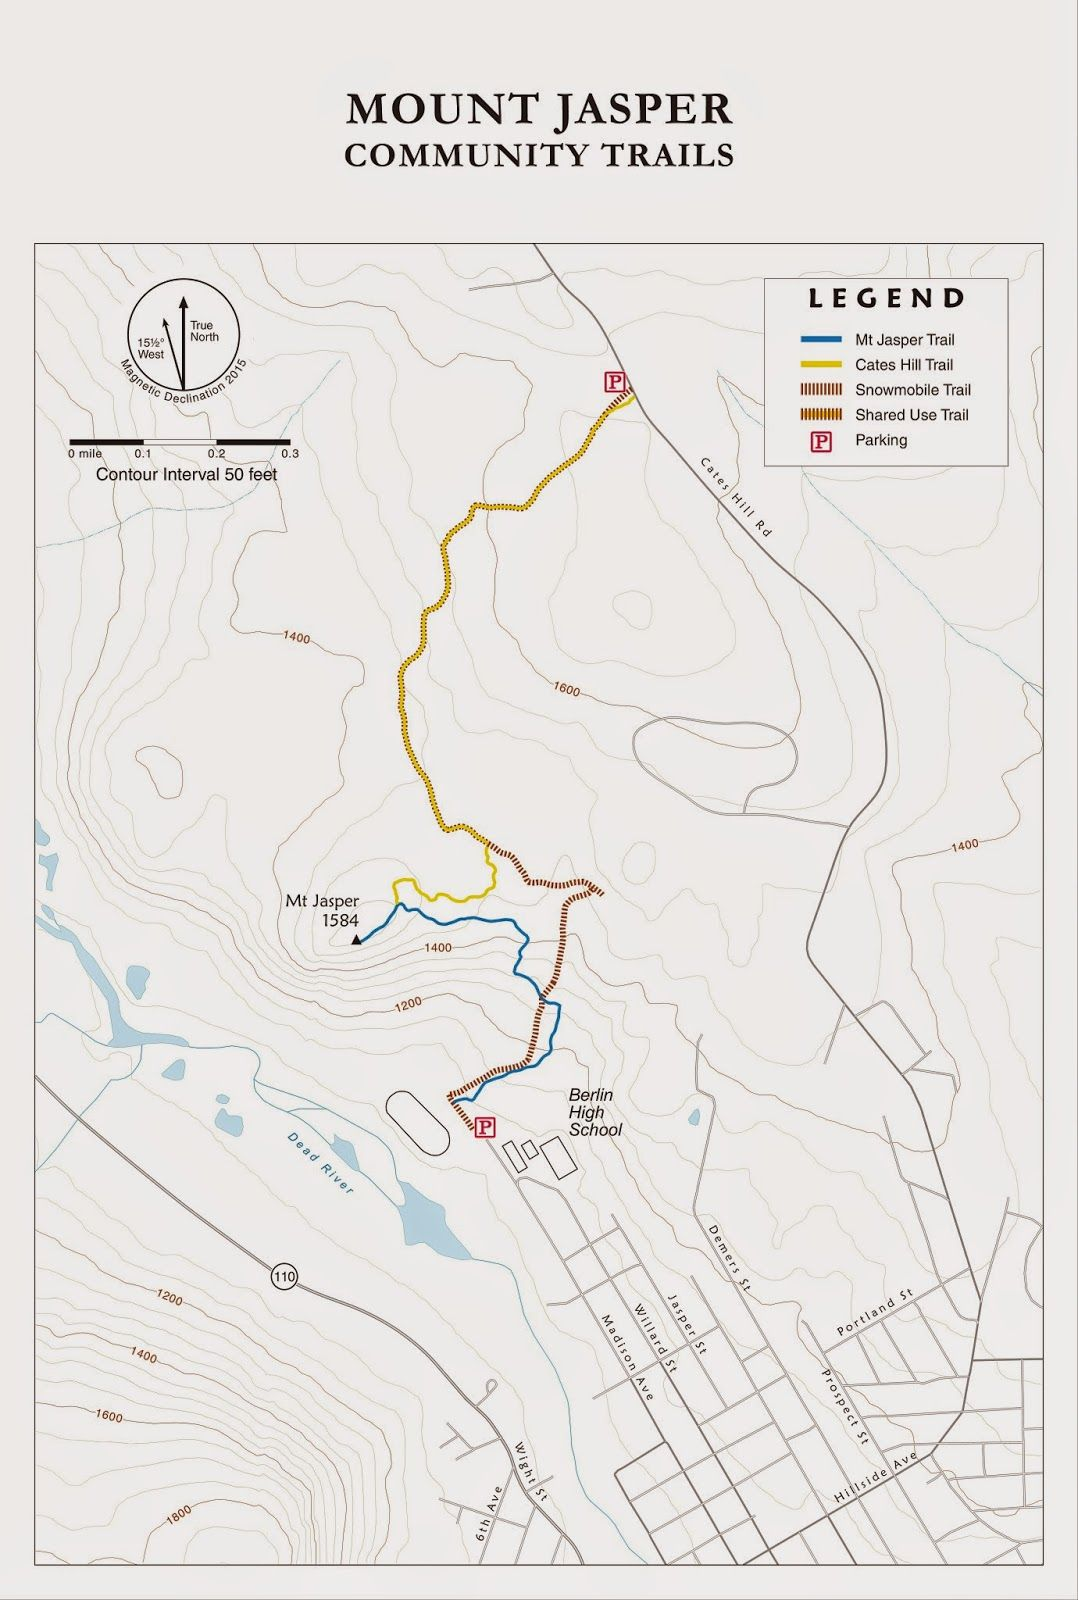 AMC Trails Blog: Trail maps and hand-inked artwork for Mt Jasper ...